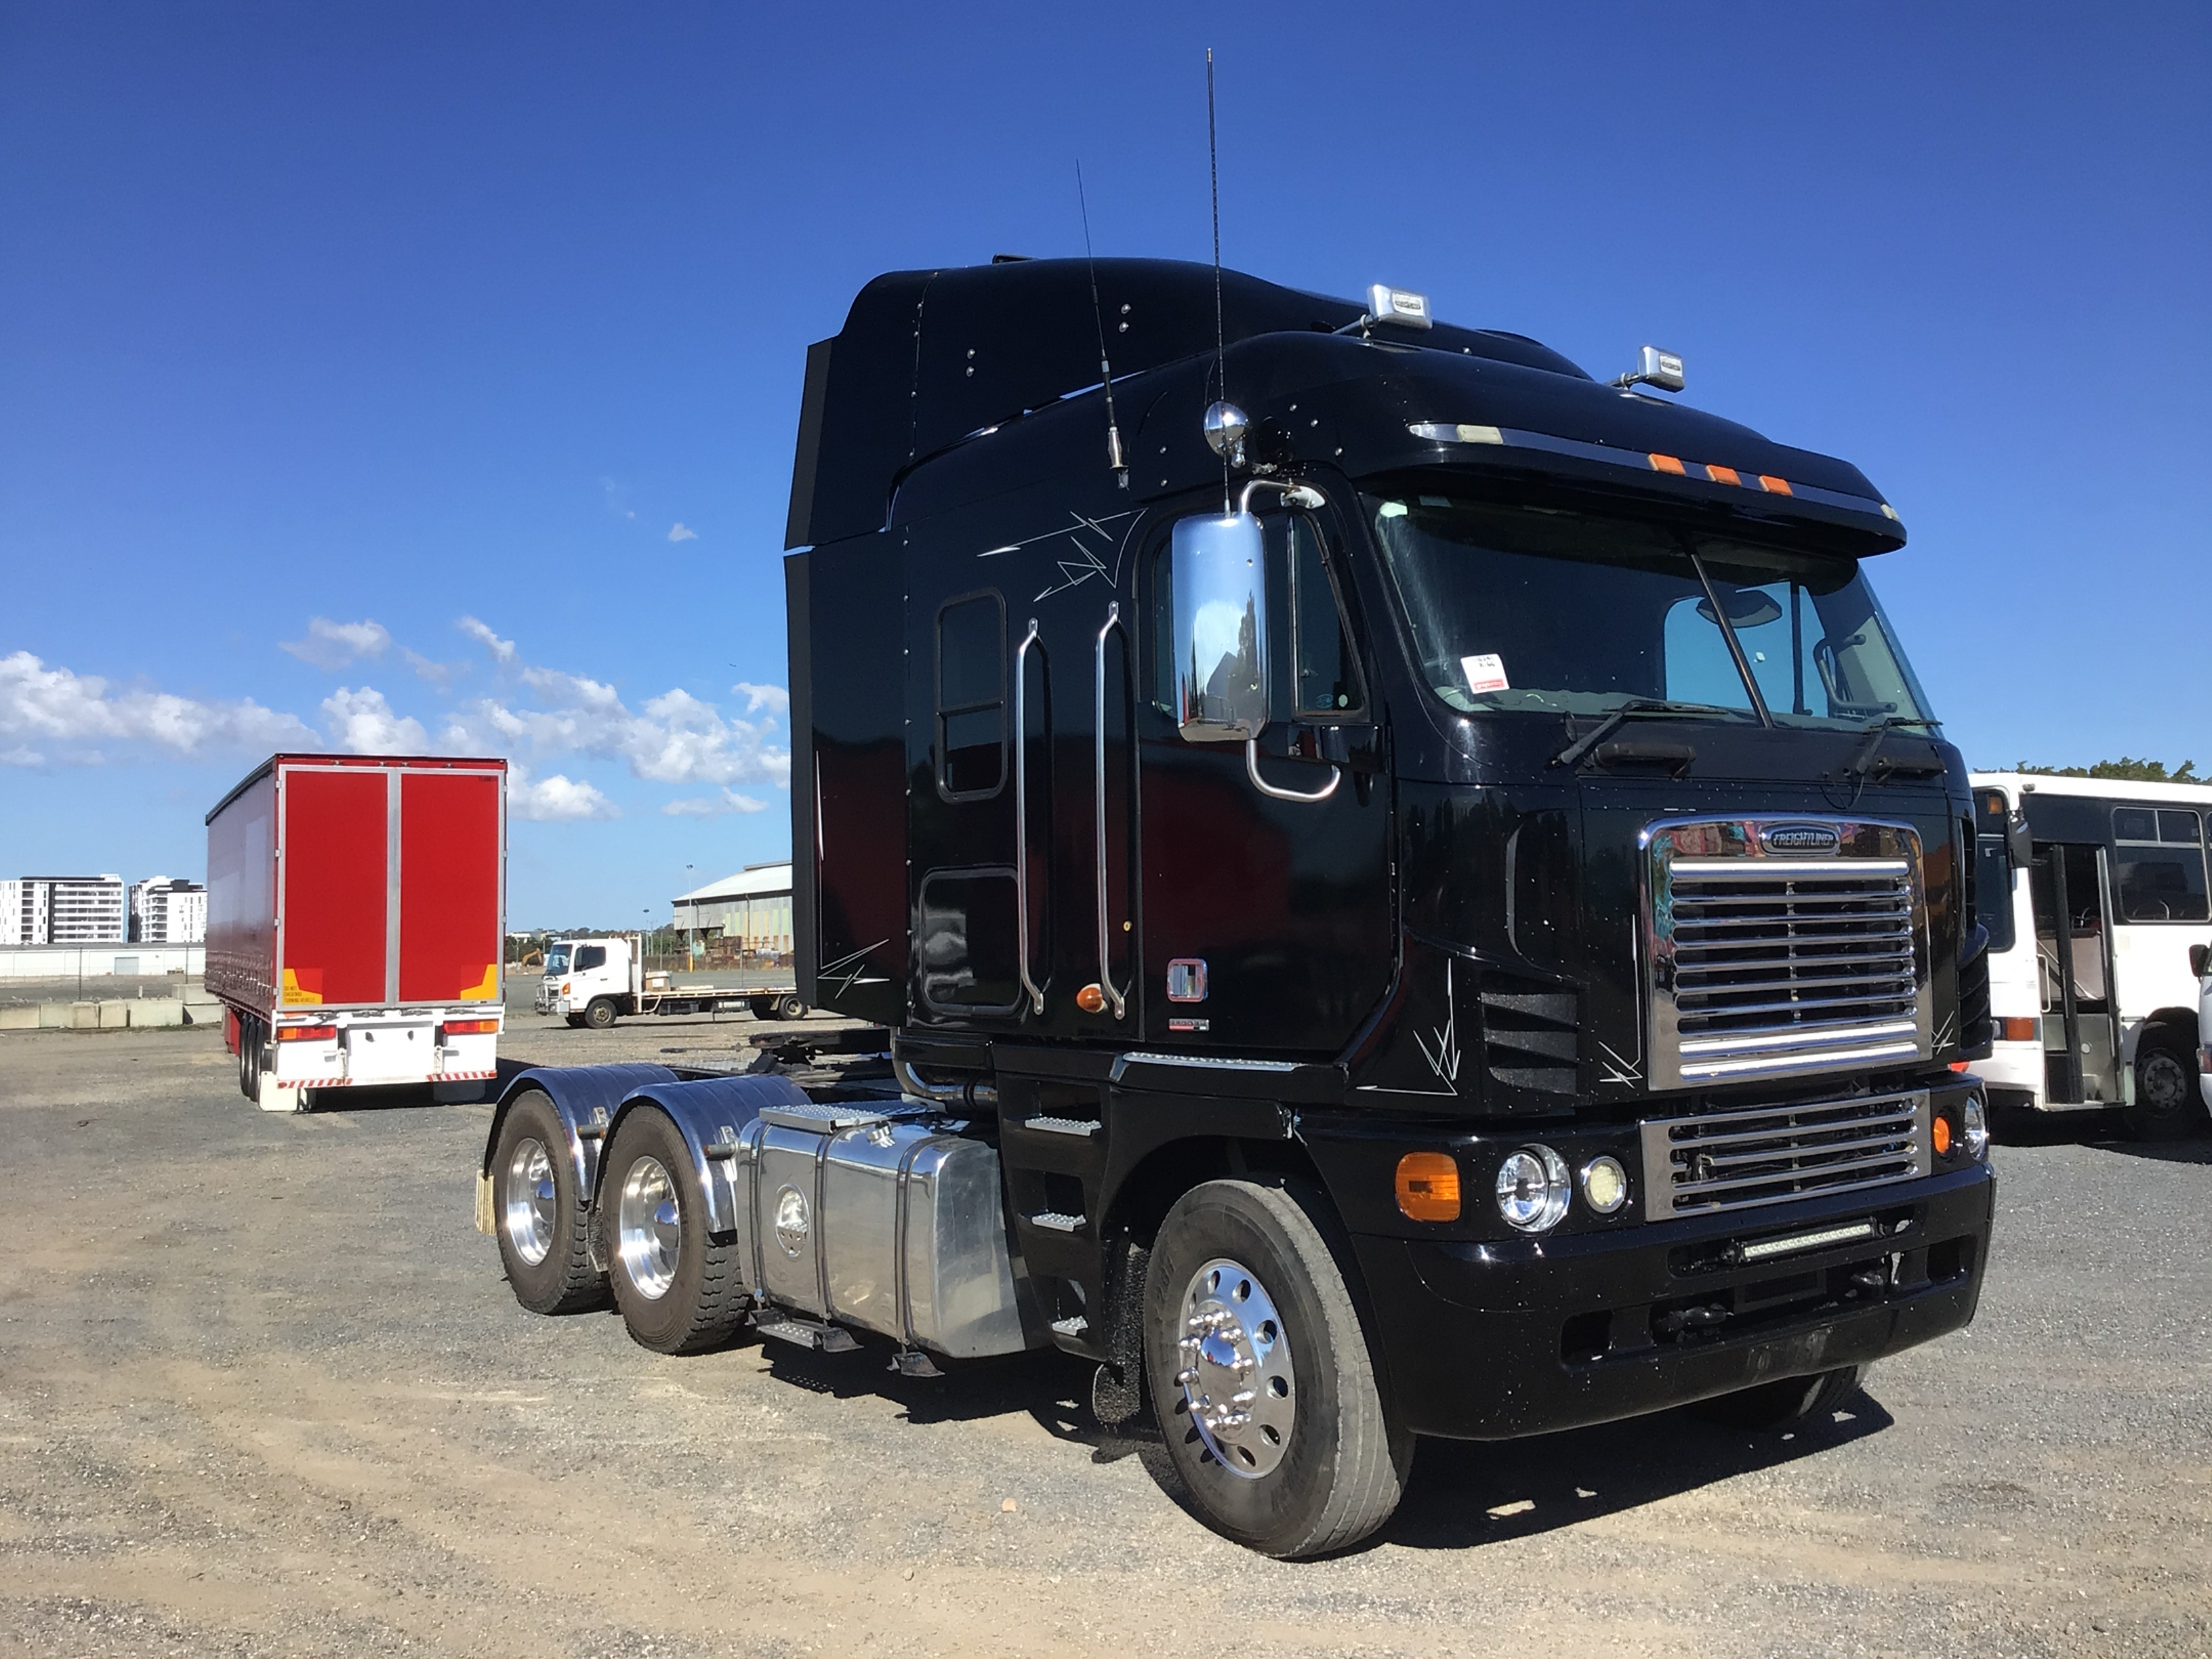 2010 Freightliner FLH Argosy 6 x 4 Prime Mover Truck